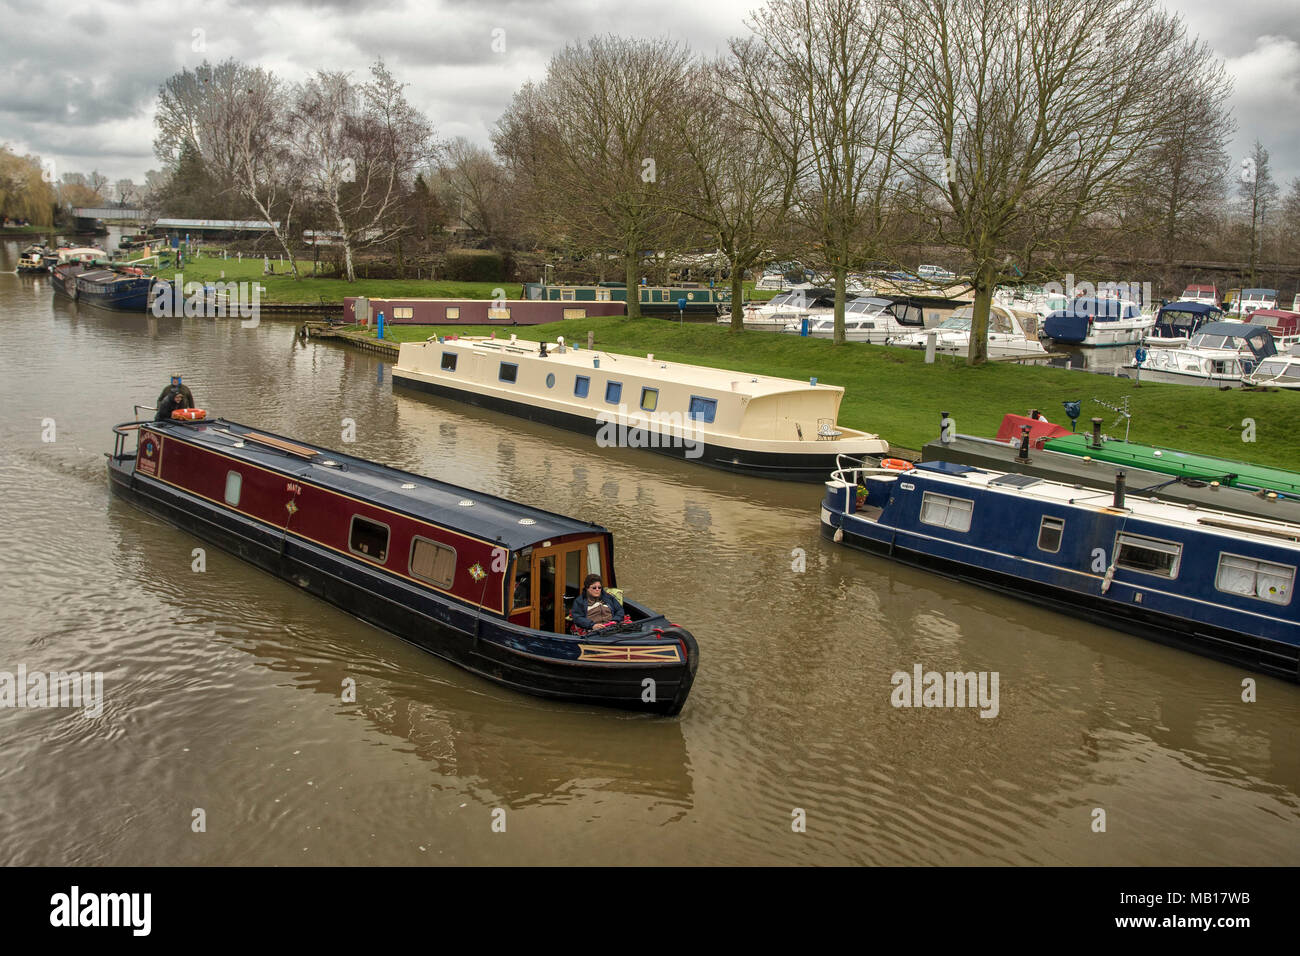 barges on the great ouse at Ely, Cambridgeshire, England, United Kingdom, Europe Stock Photo